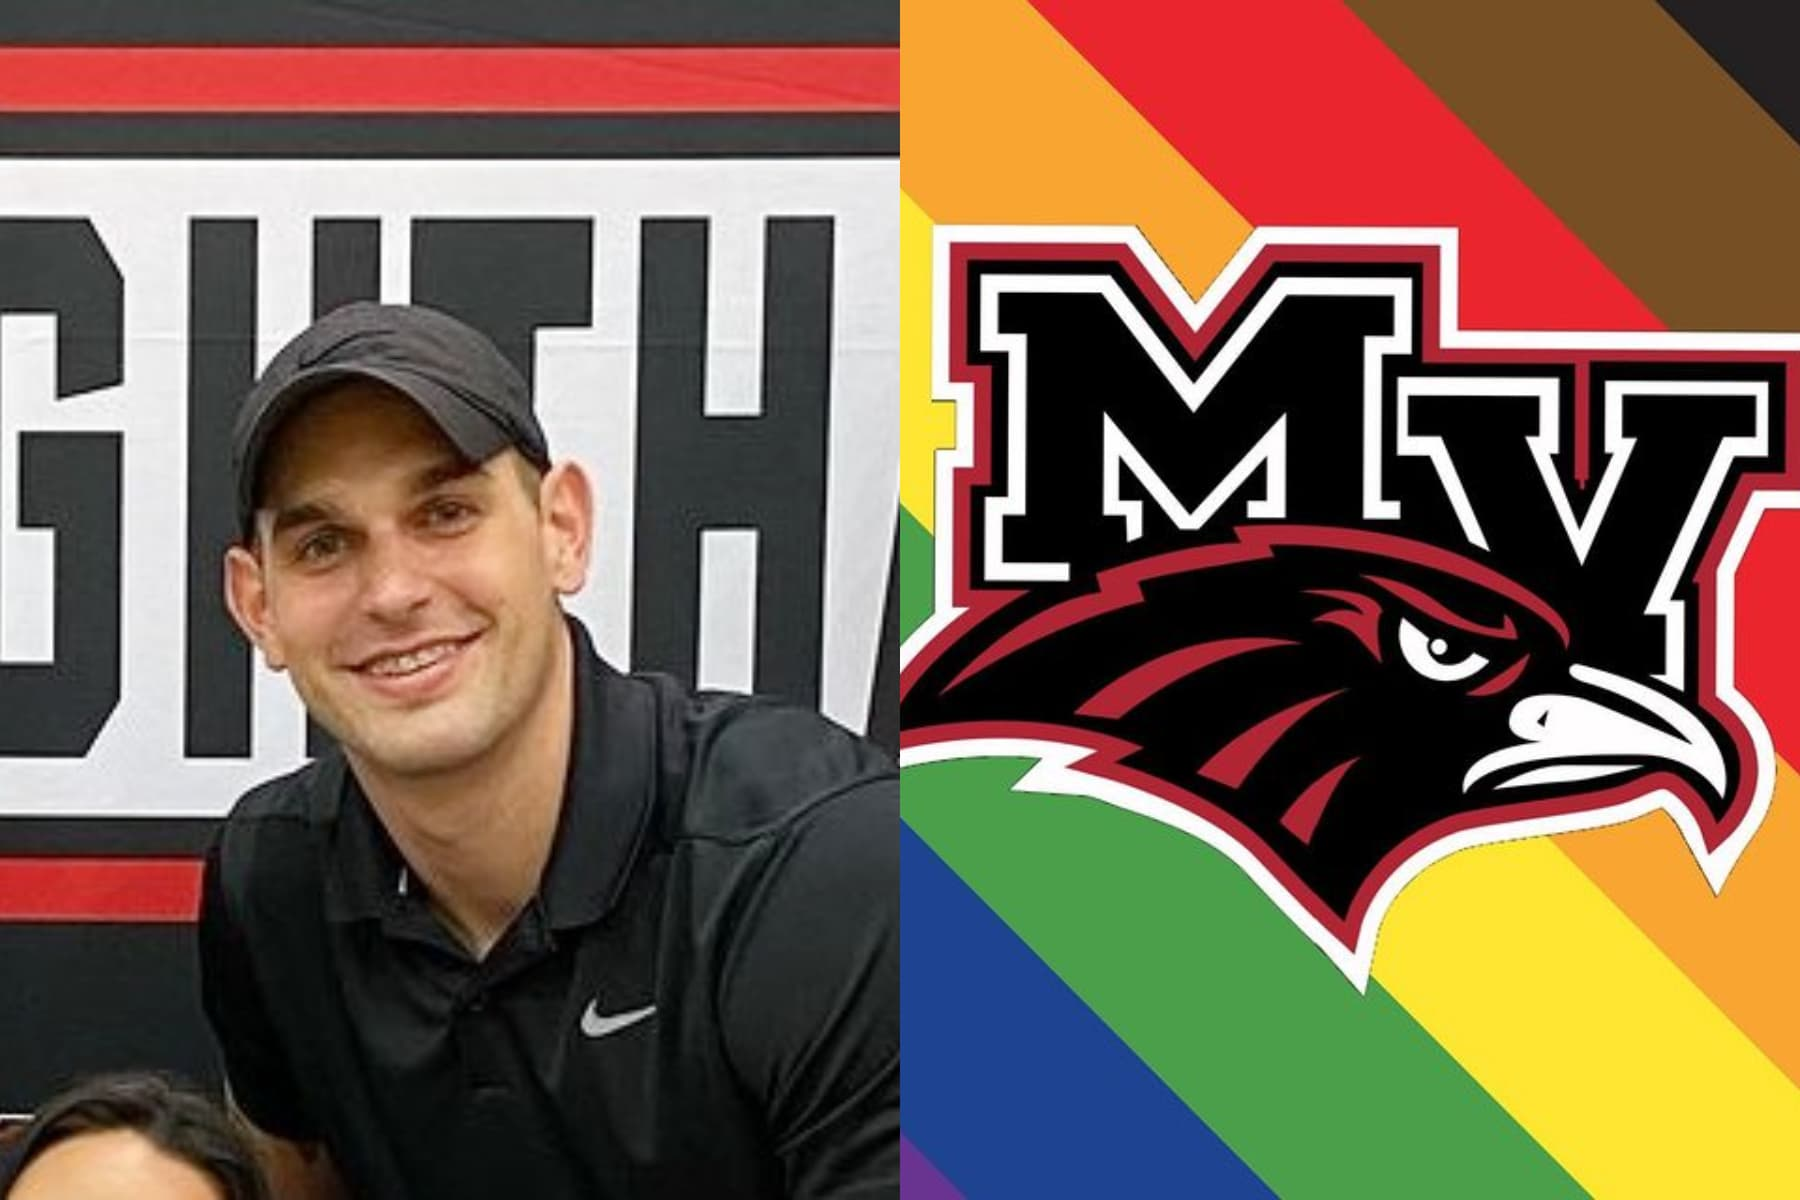 michael henderson, cheer, coach, gay